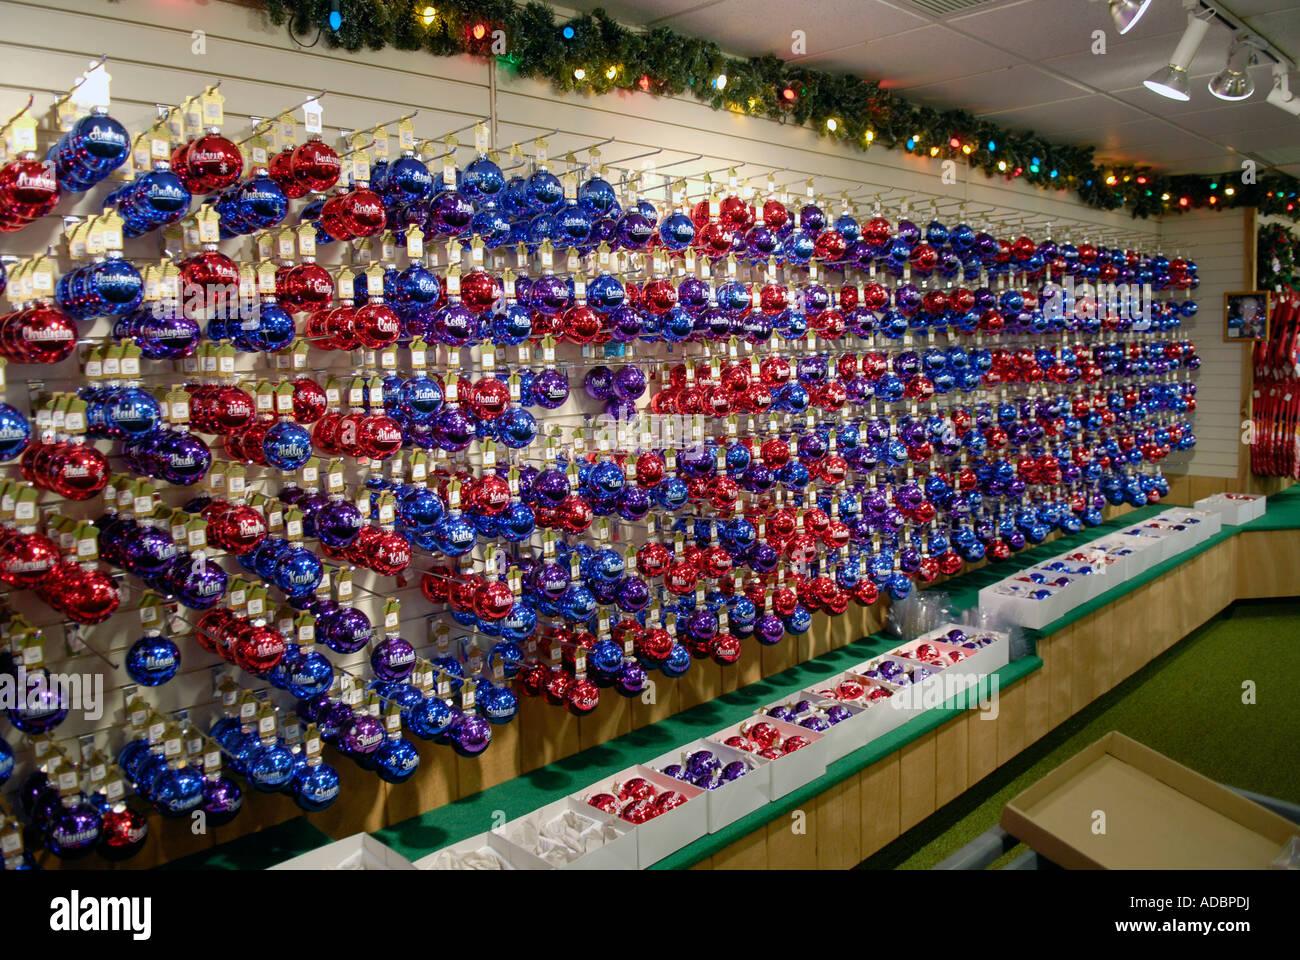 Bronners Christmas Wonderland.Bronners Christmas Wonderland In Historical Frankenmuth